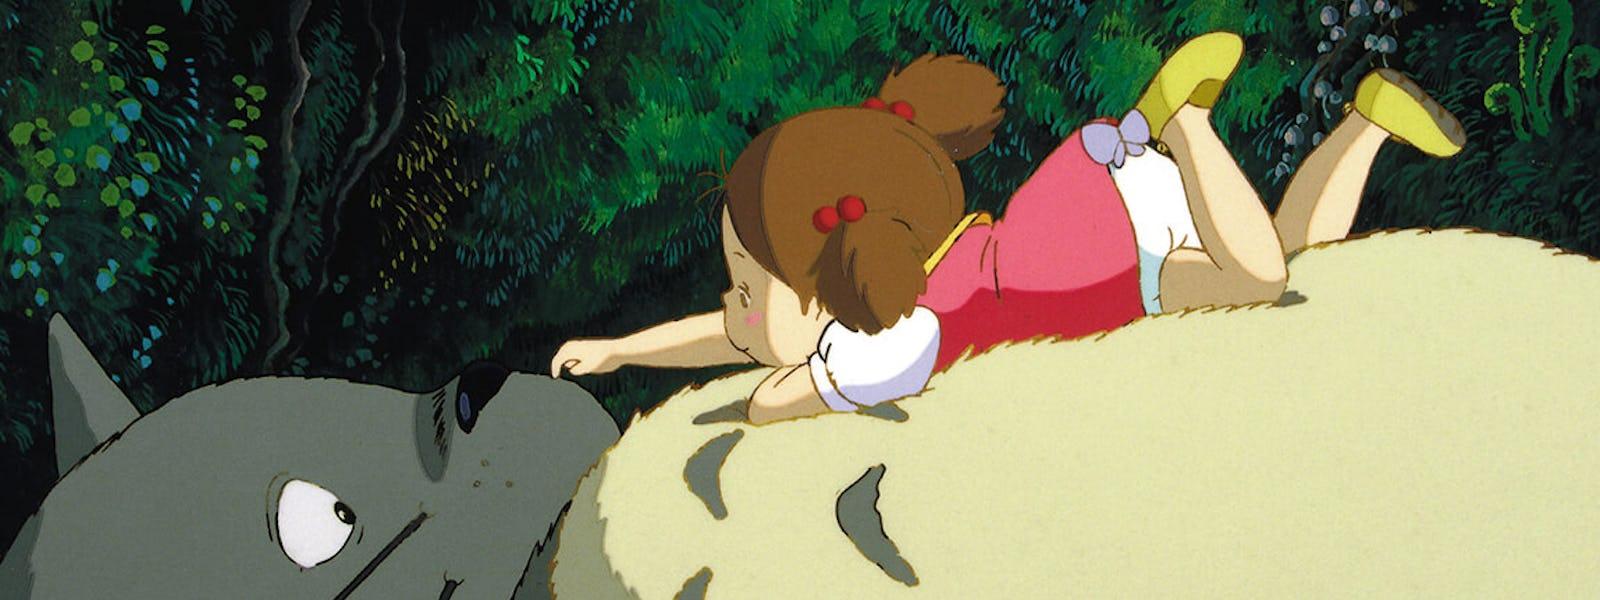 Bild - Min granne Totoro